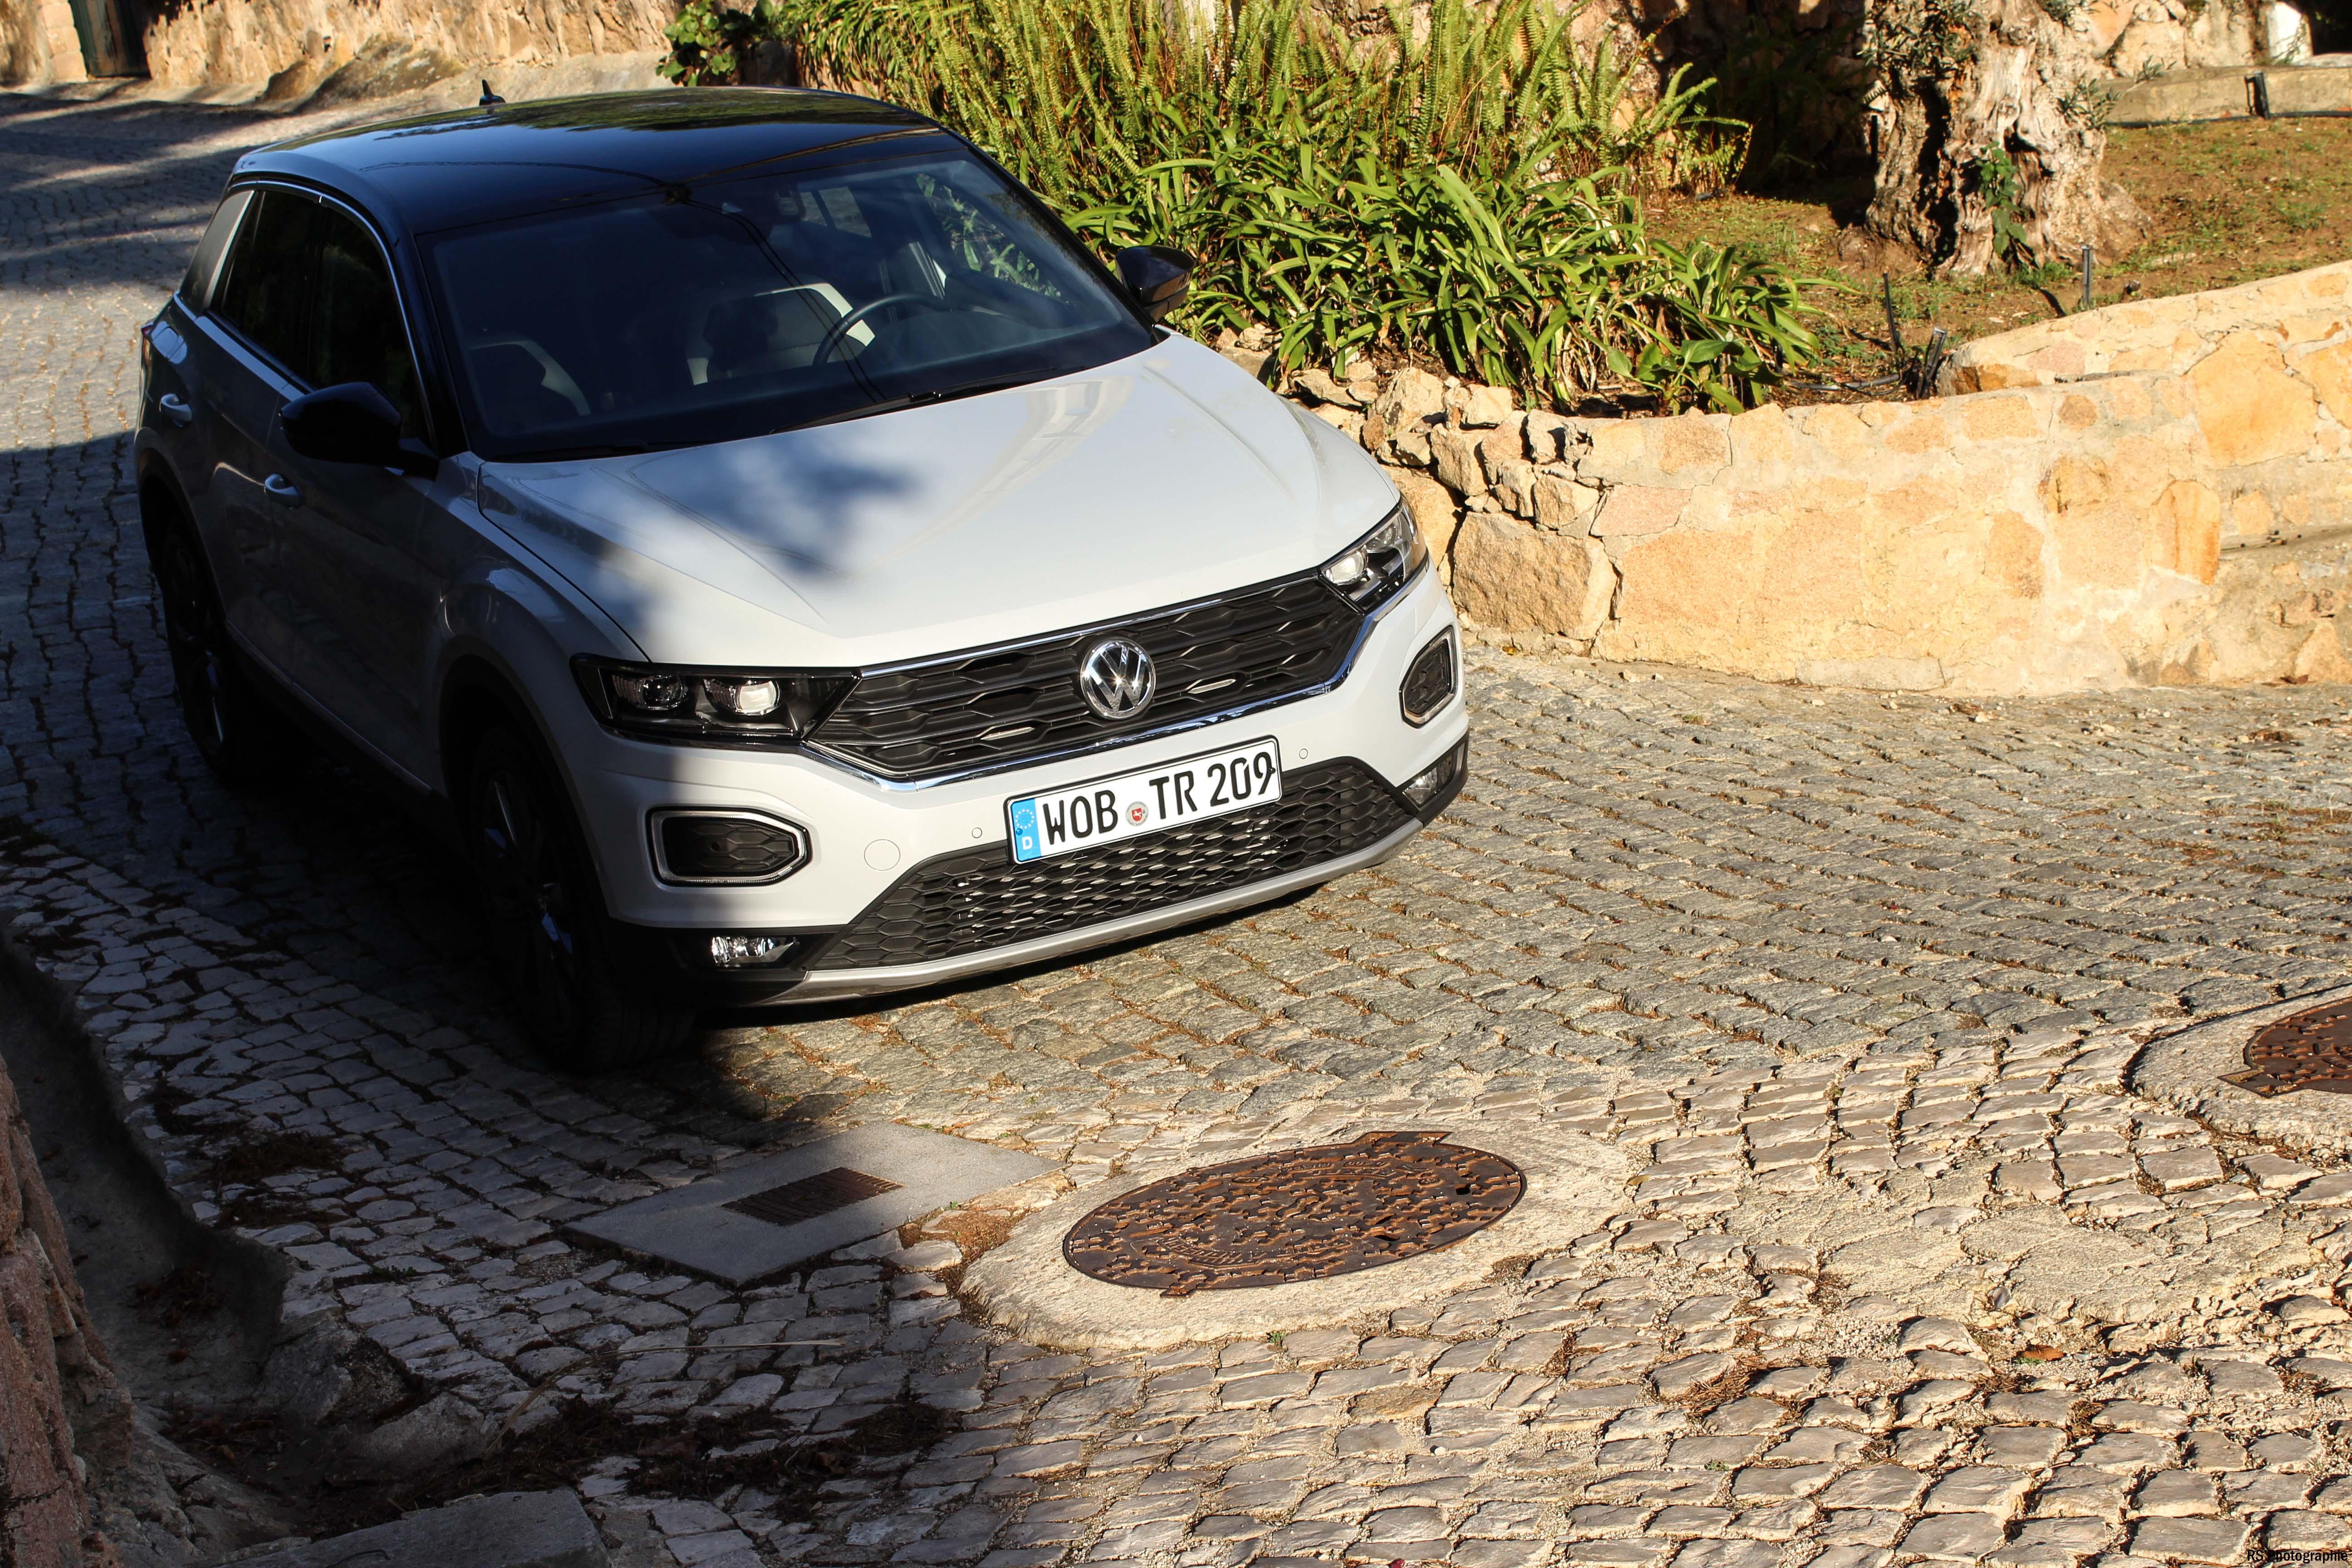 Volkswagentroc37-vw-t-roc-avant-front-Arnaud Demasier-RSPhotographie